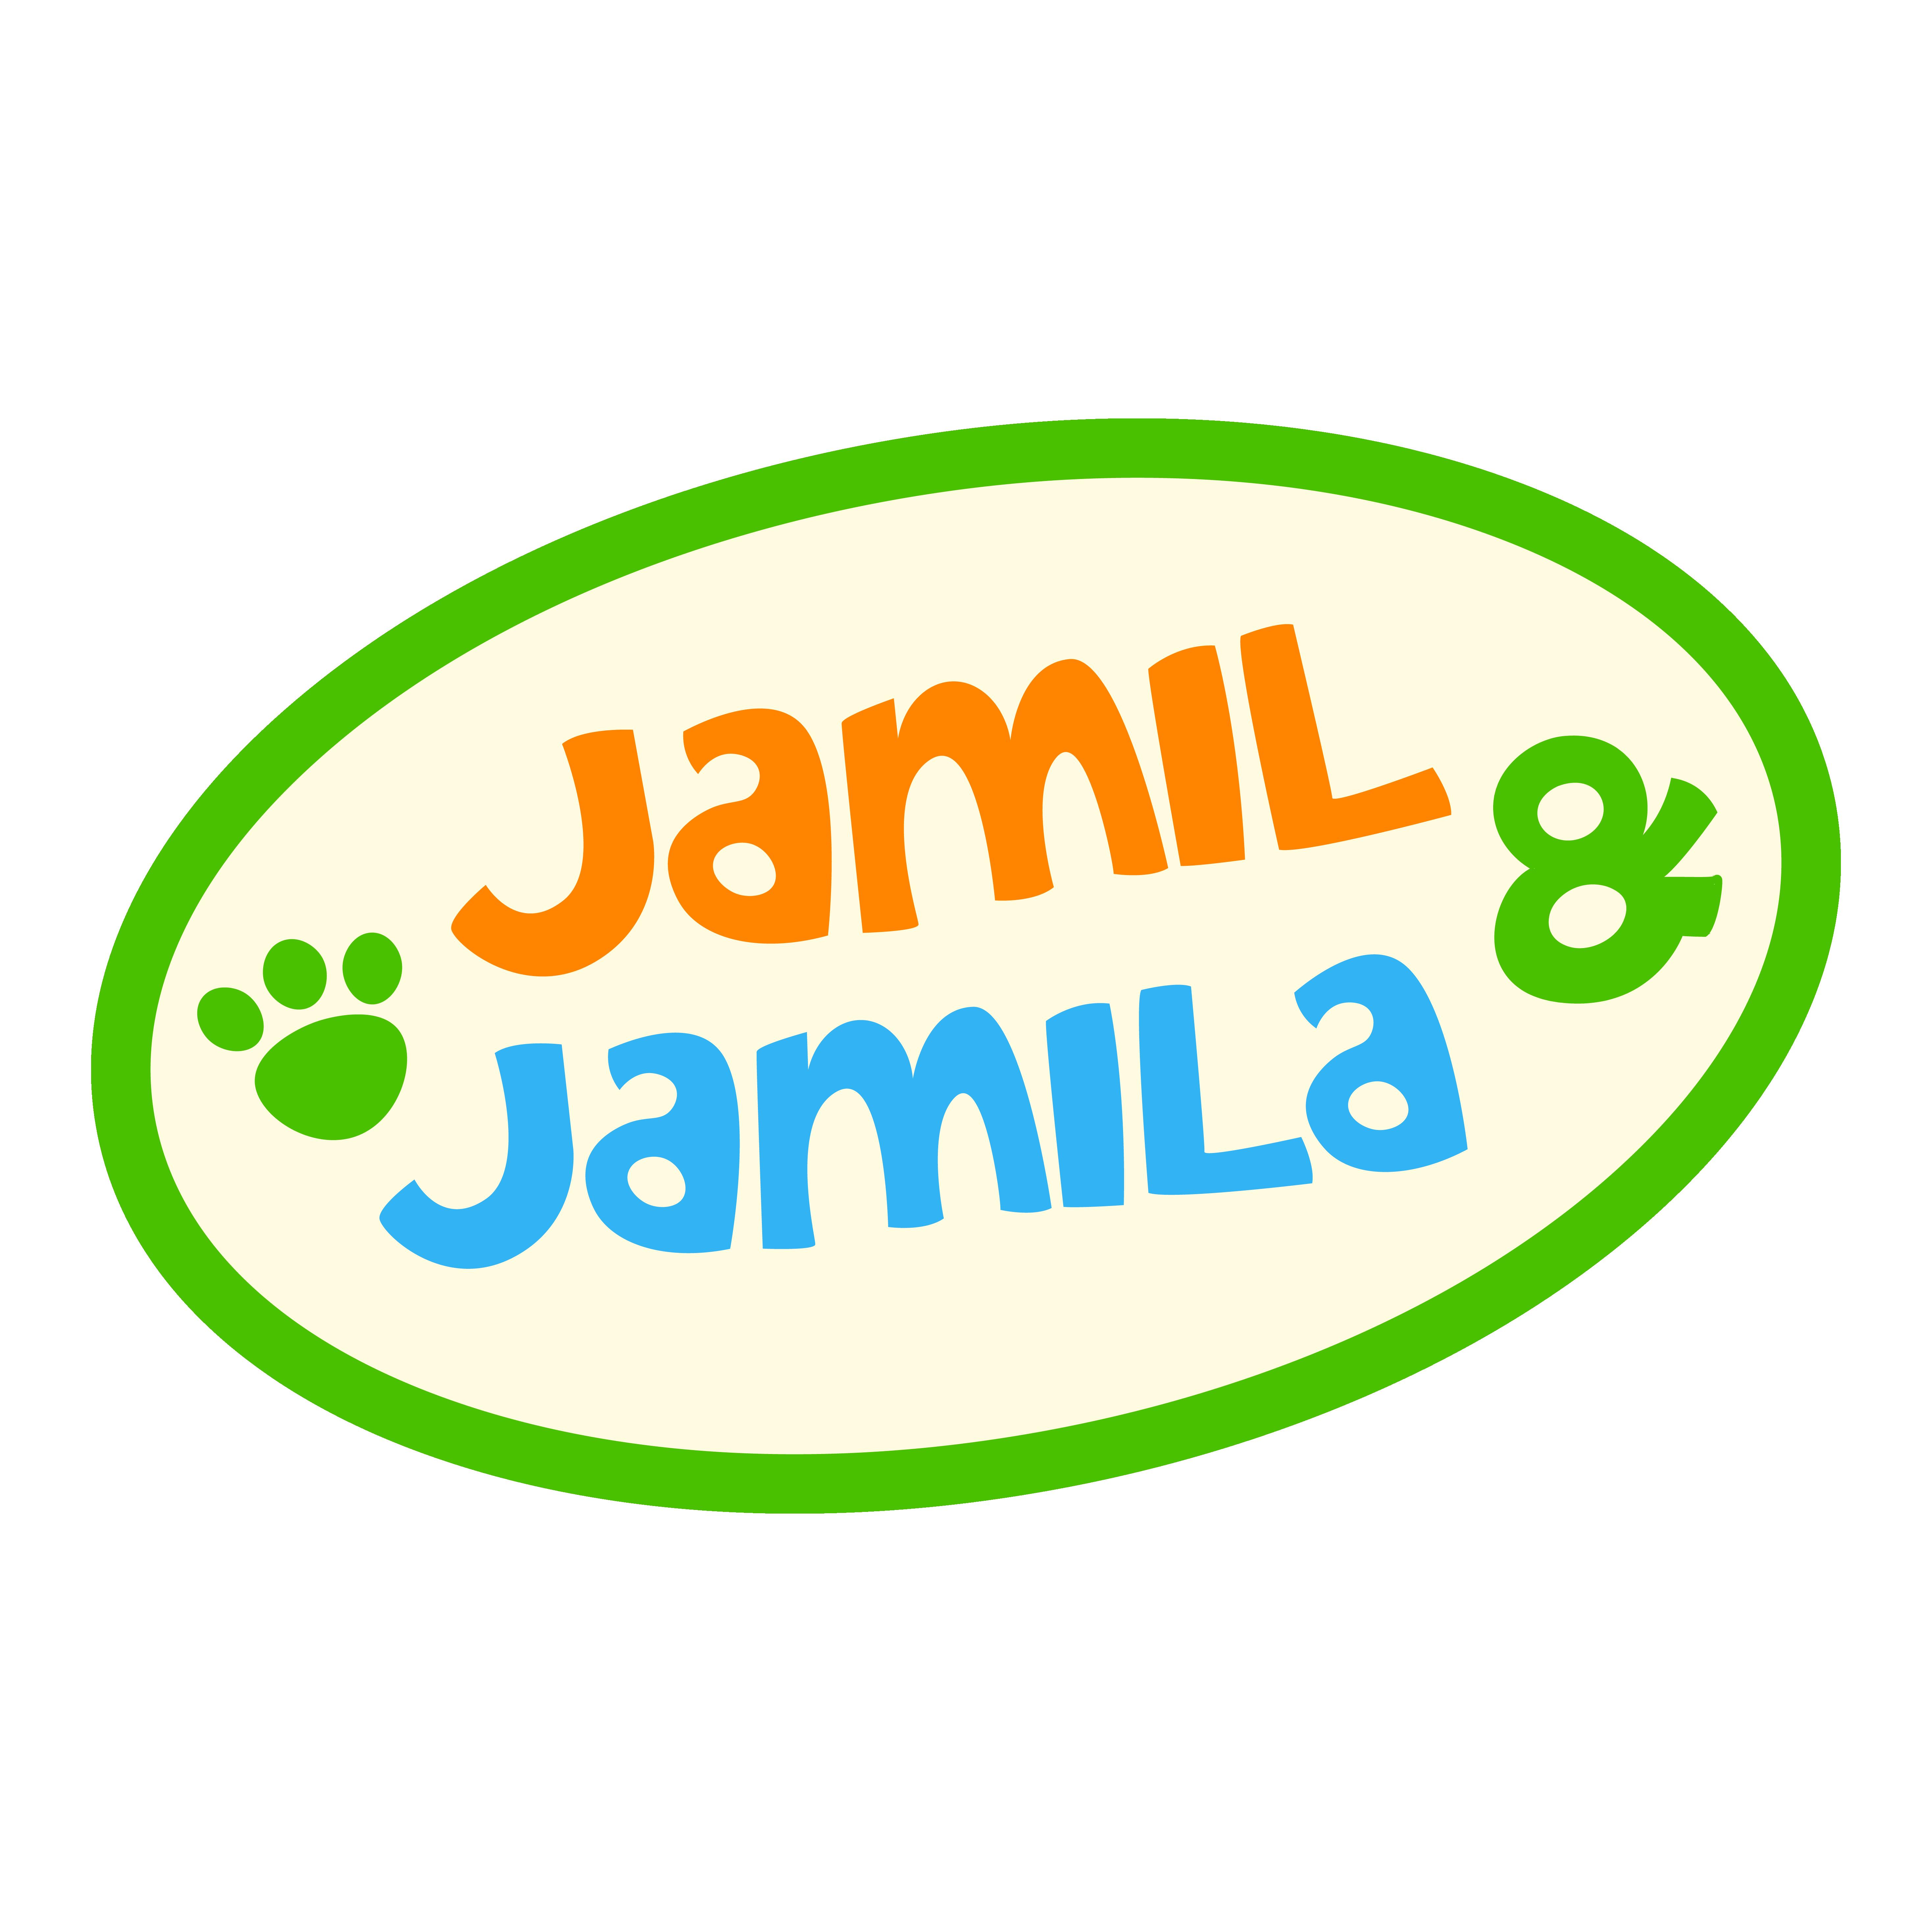 Jamil and Jamila